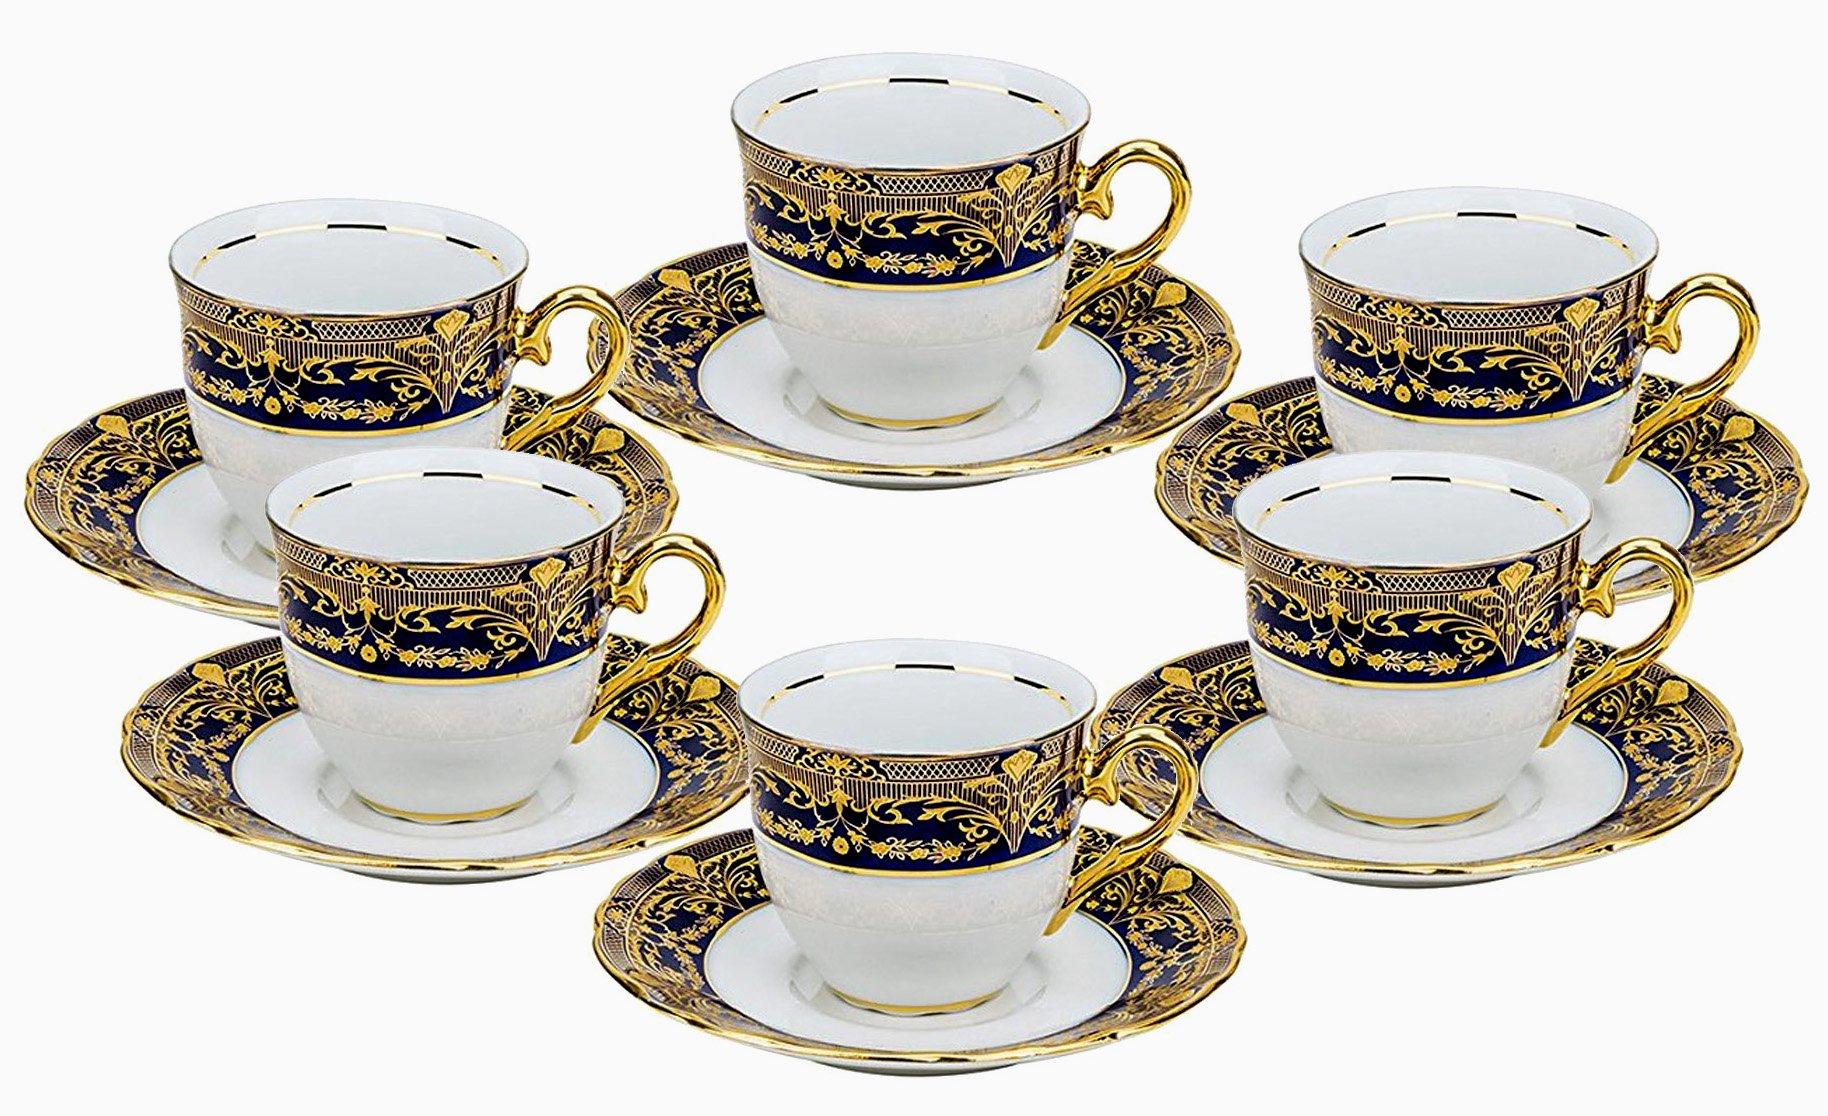 Euro Porcelain 12-pc. Tea Cup Coffee Set, Vintage Cobalt Blue Ornament, 24K Gold-plated Accents, Premium Bone China 6 Cups (8 oz) and Saucers, Original Czech Tableware